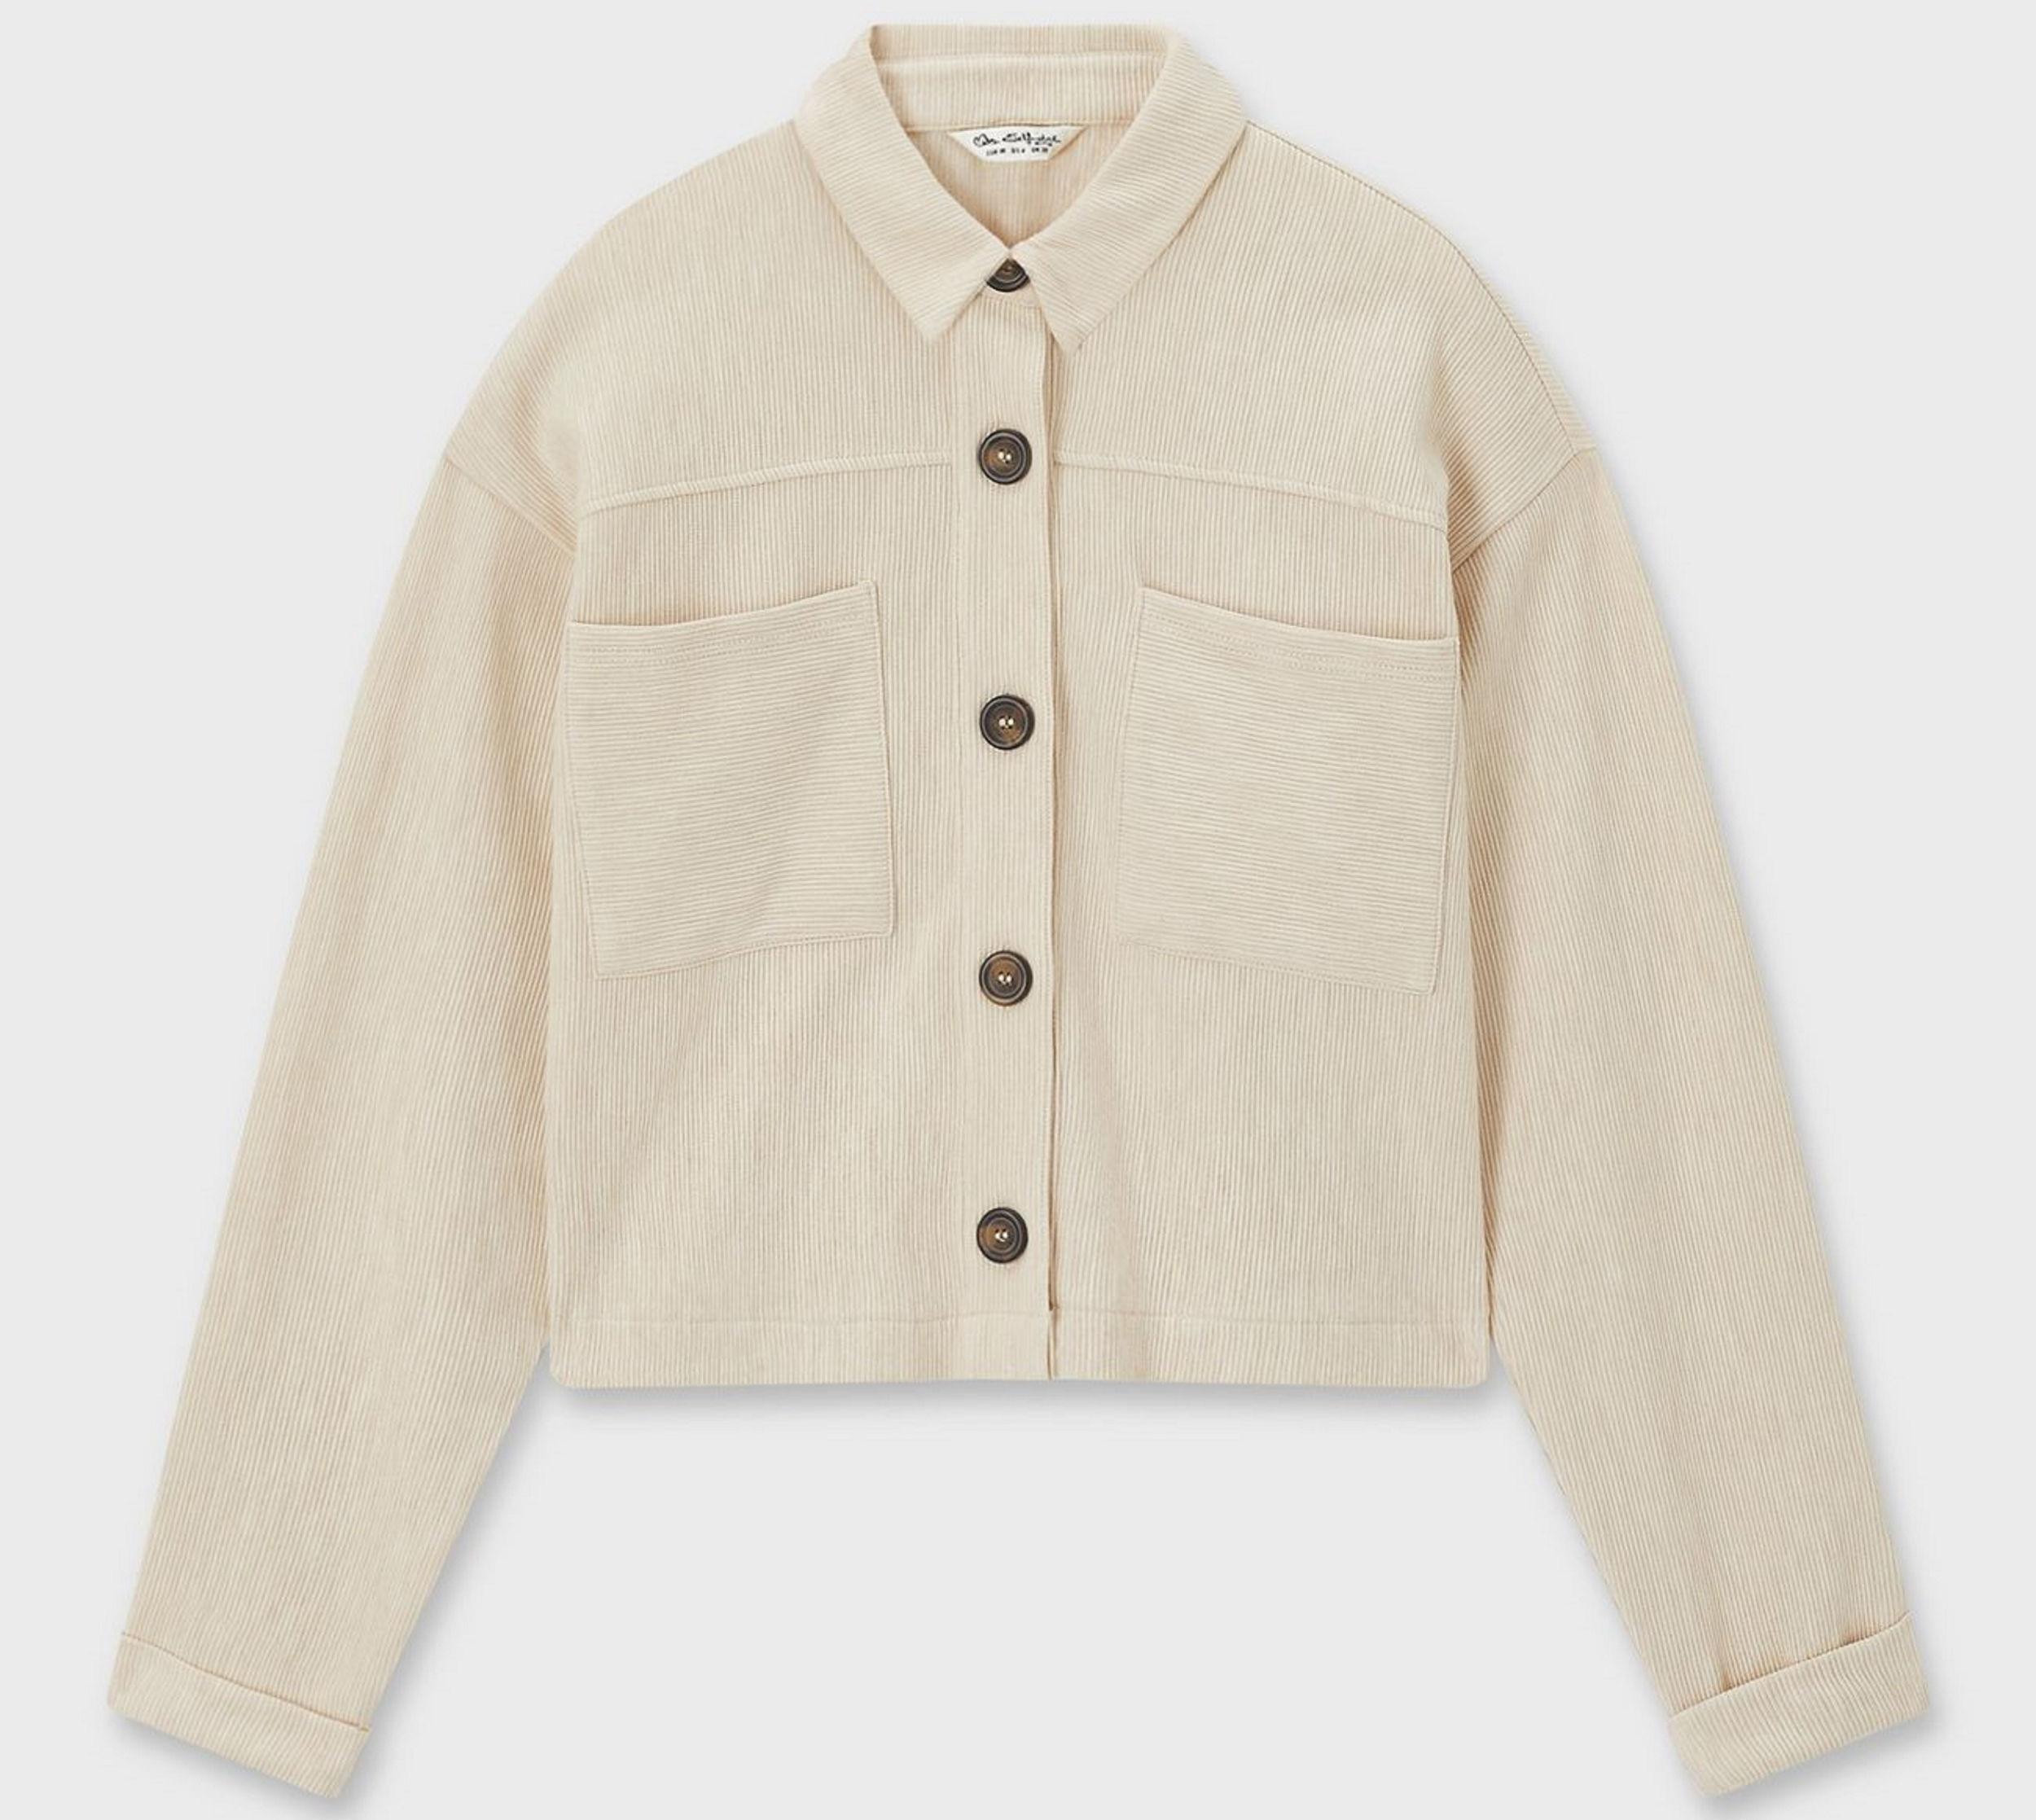 5. Miss Selfridge Ottoman Utility Jacket